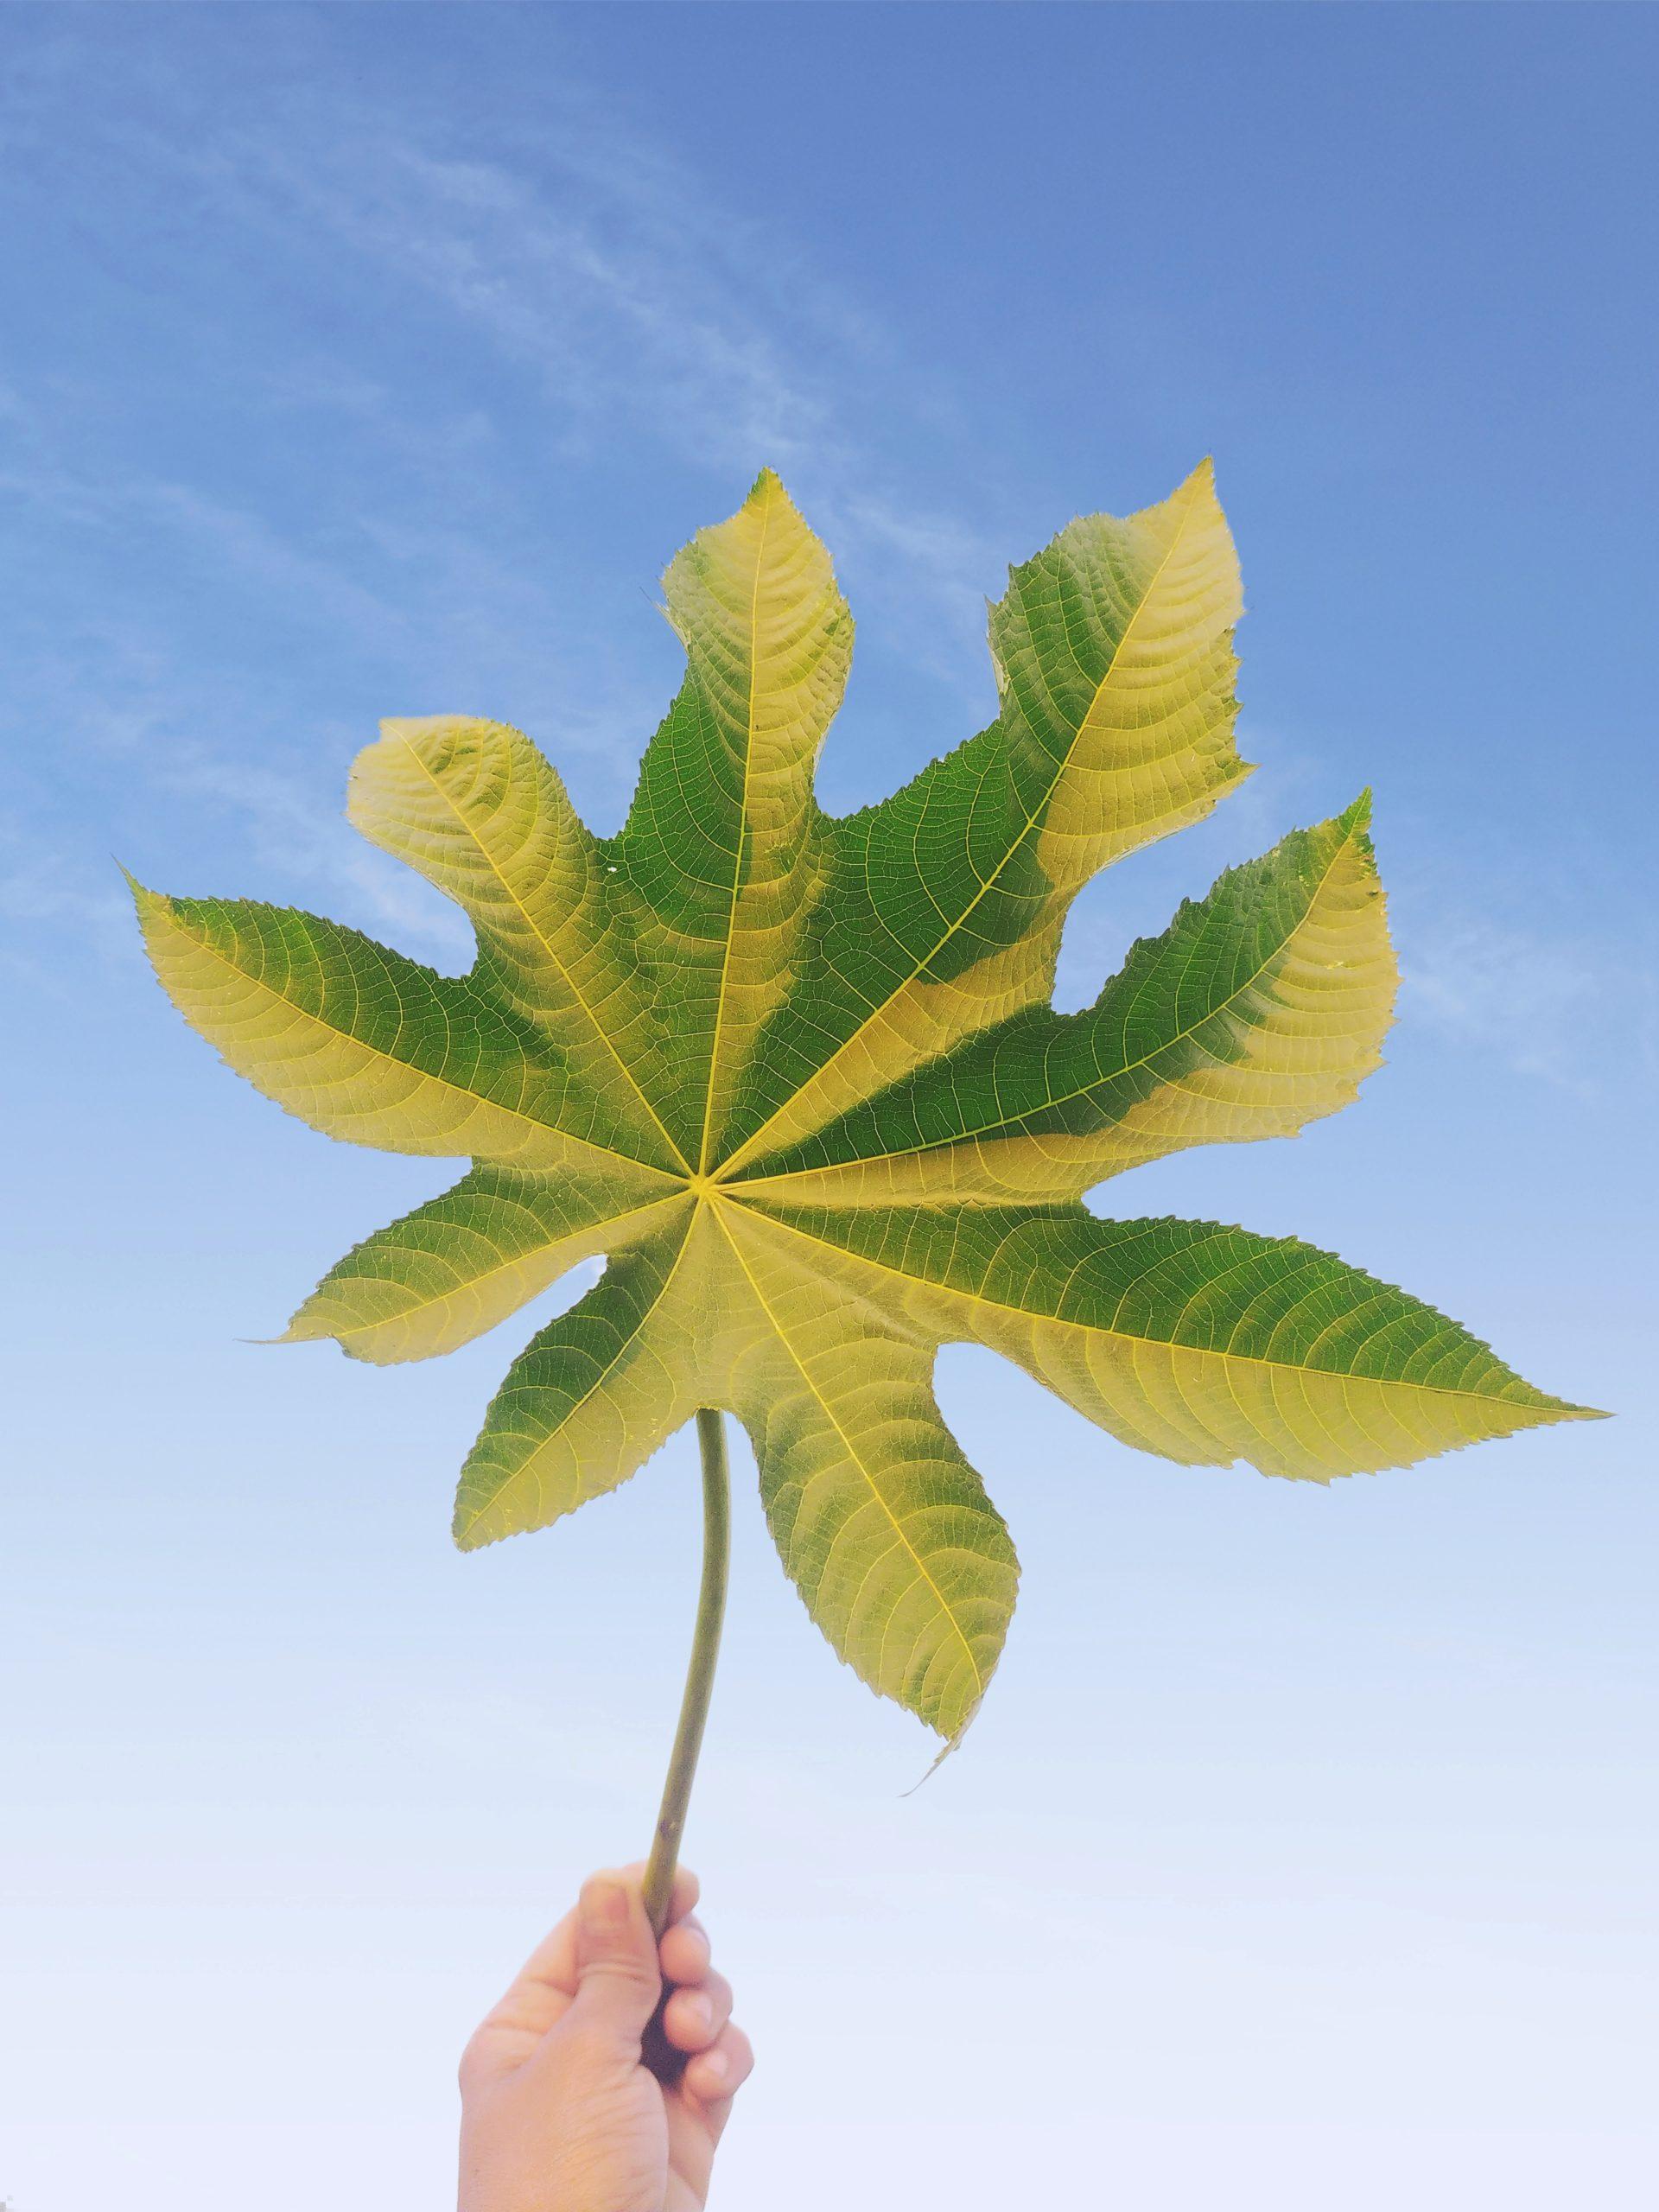 Green leaf in hand